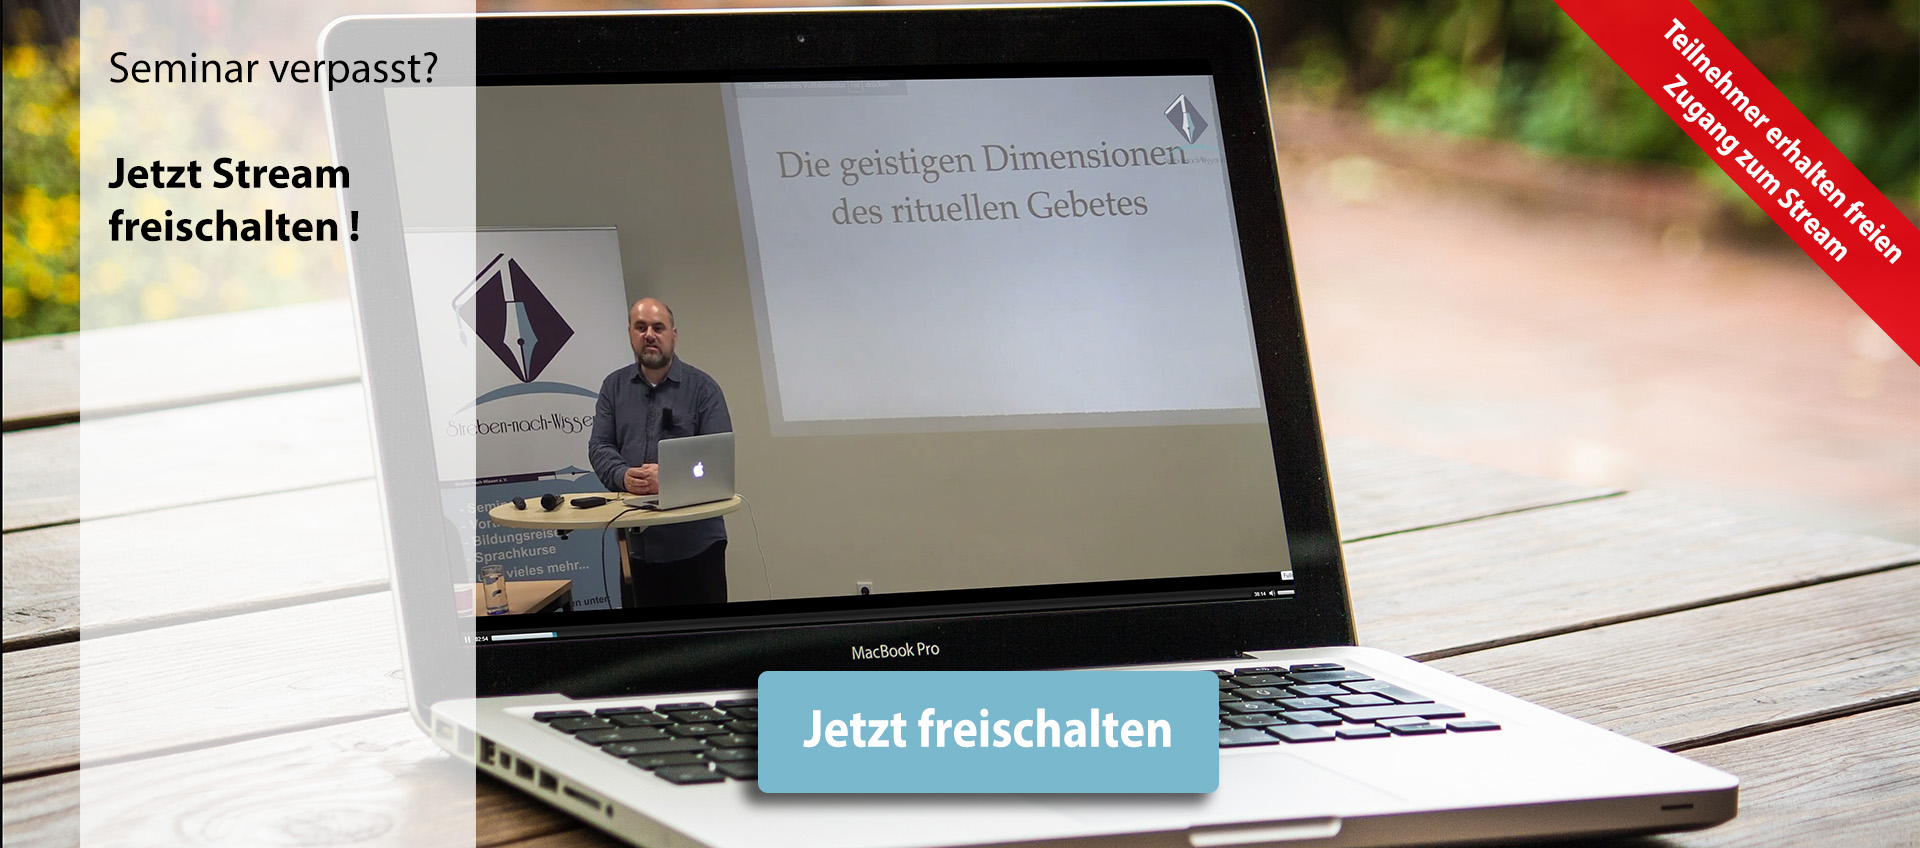 slideshow Seminar verpasst 2